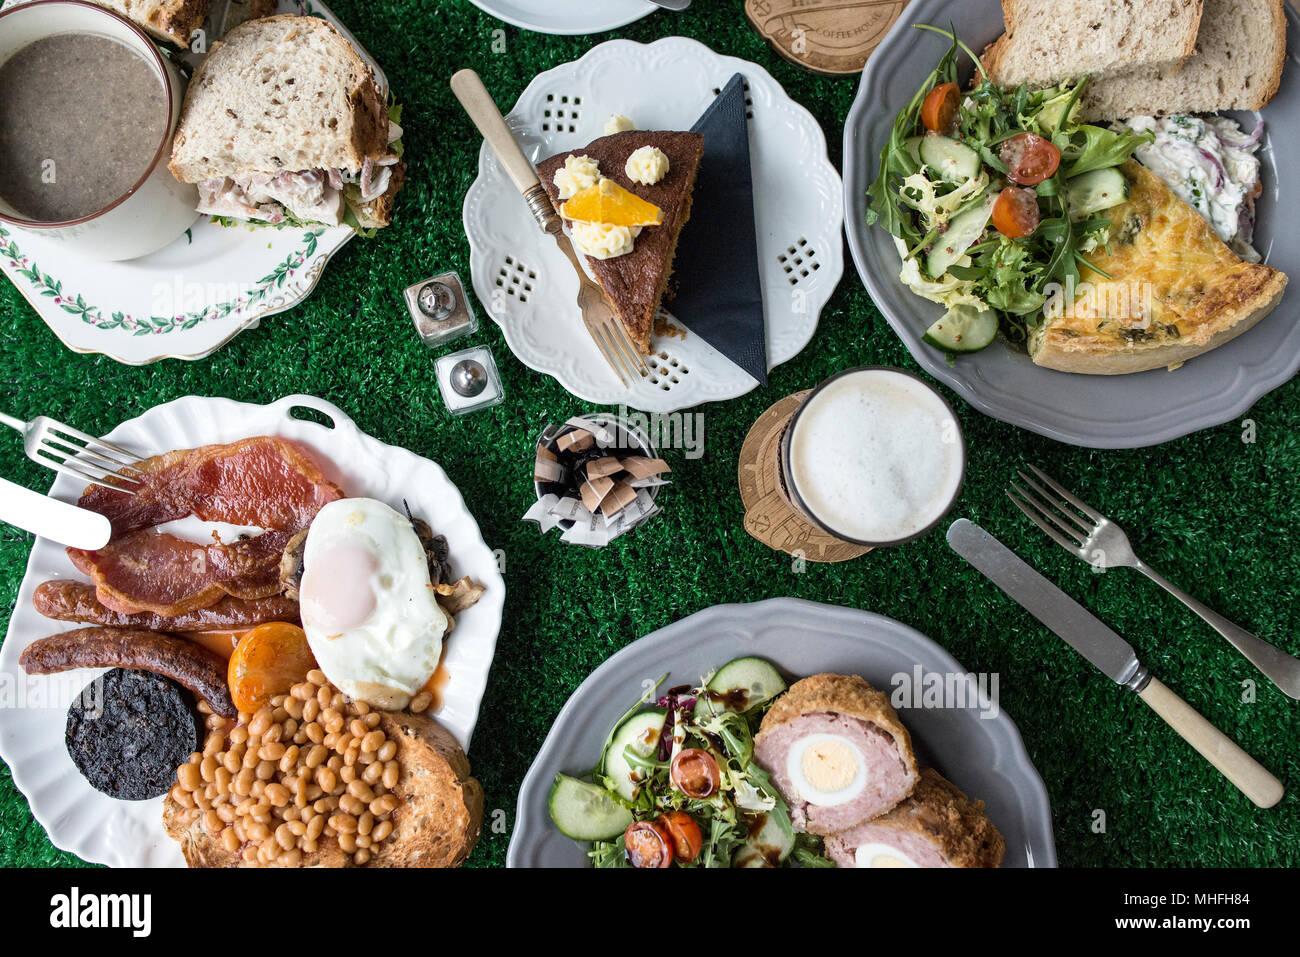 Cafe comida disparó desde arriba Imagen De Stock